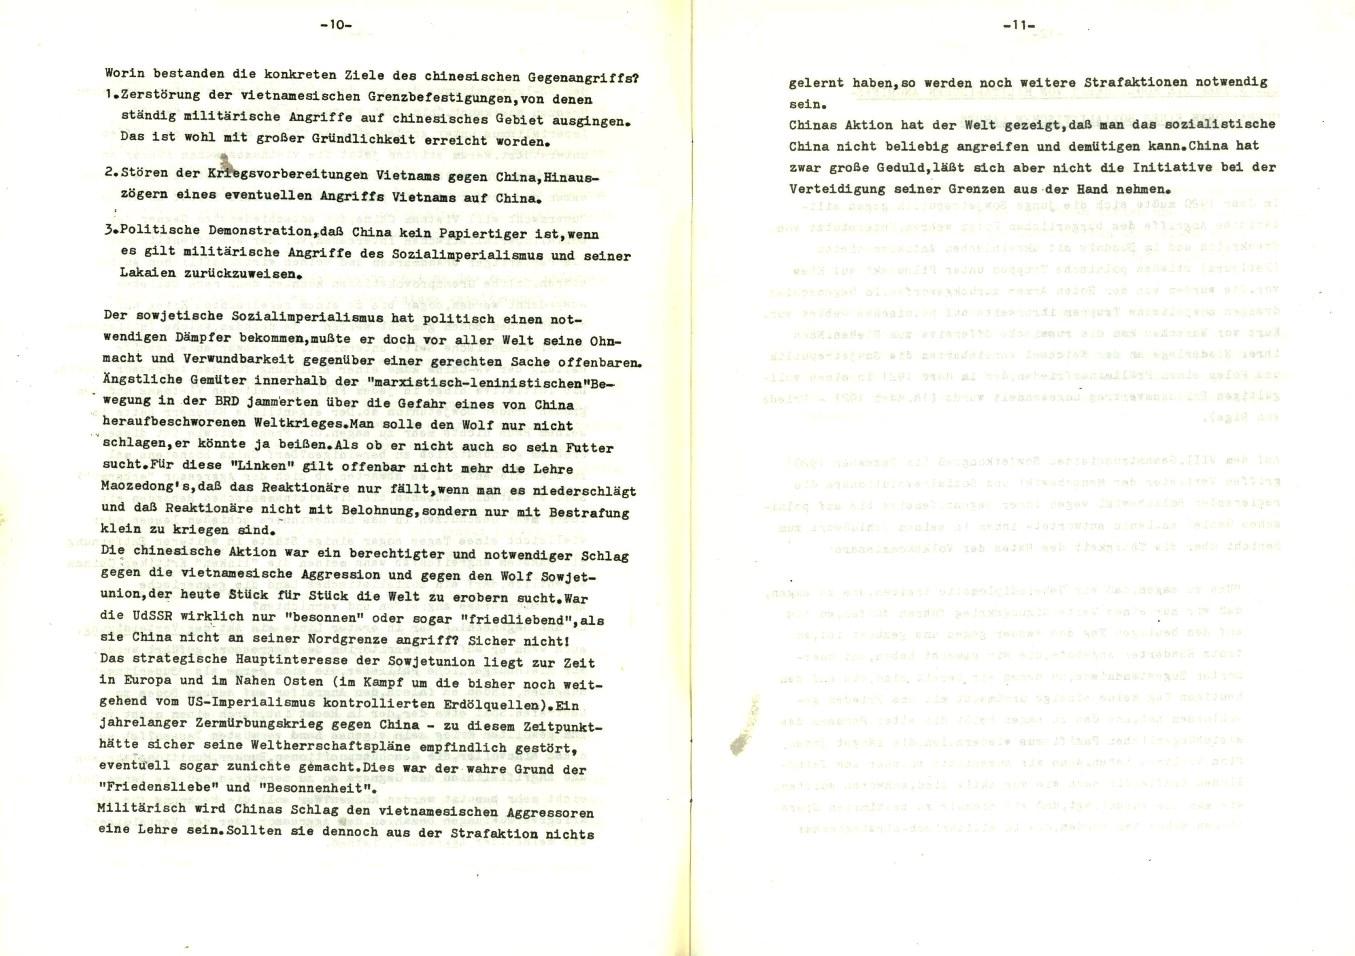 Muenchen_Kampf_dem_Revisionismus_1979_10_06